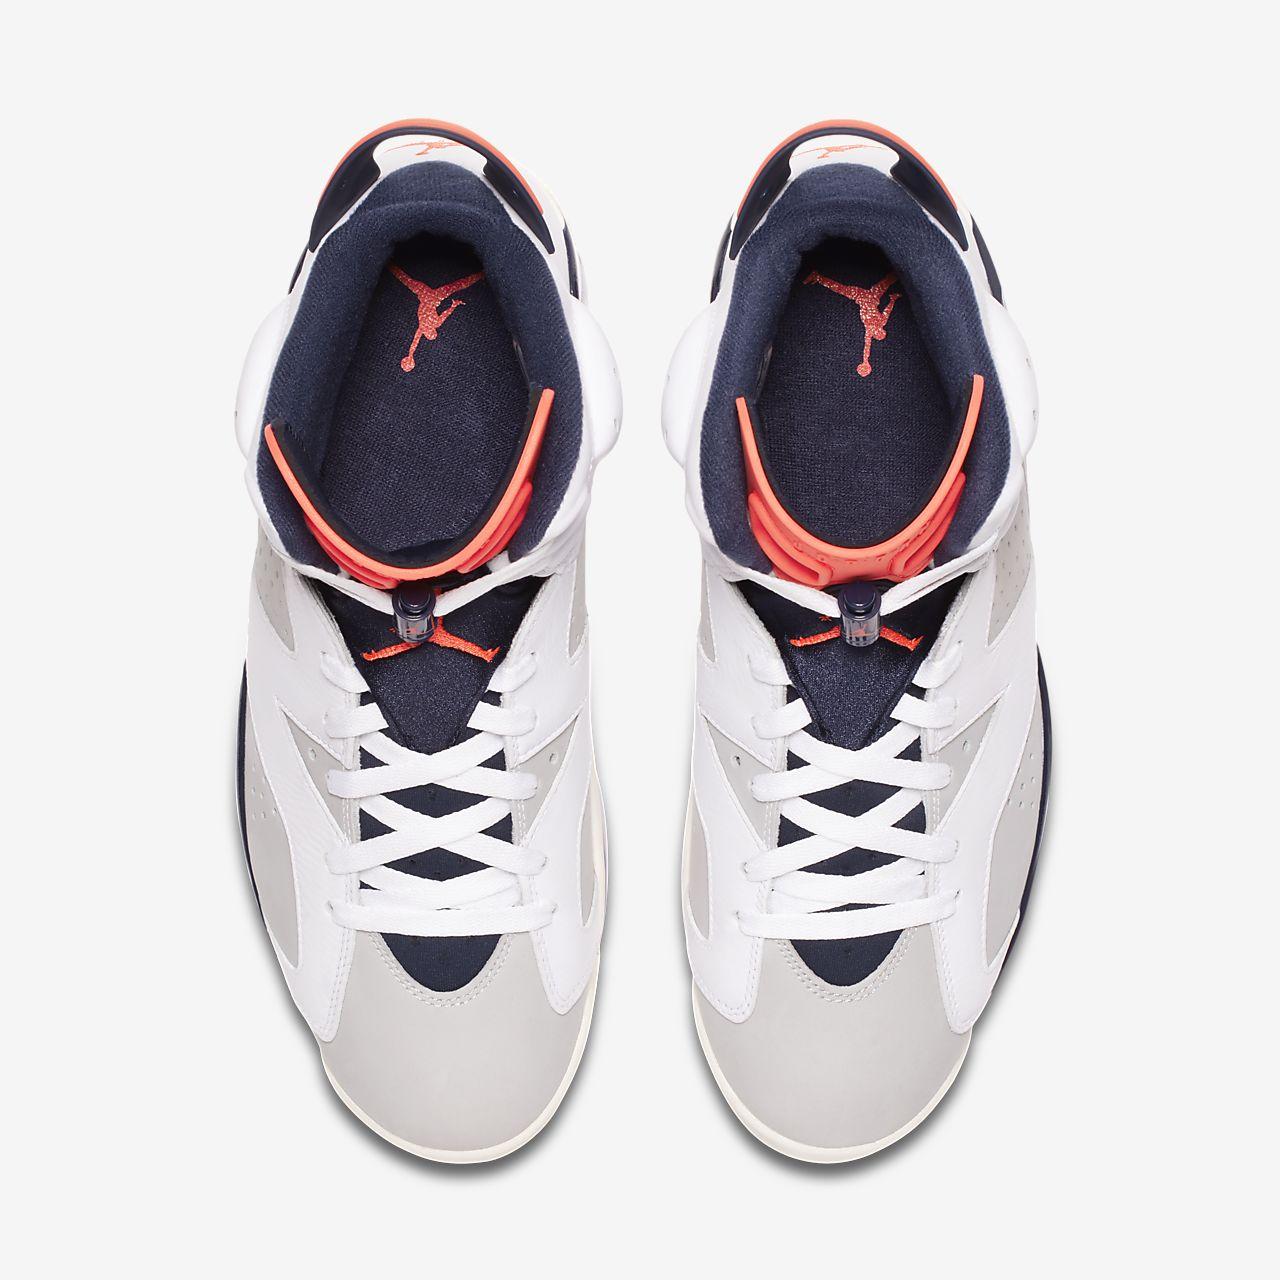 best cheap 1d763 a8418 ... Air Jordan 6 Retro Men s Shoe